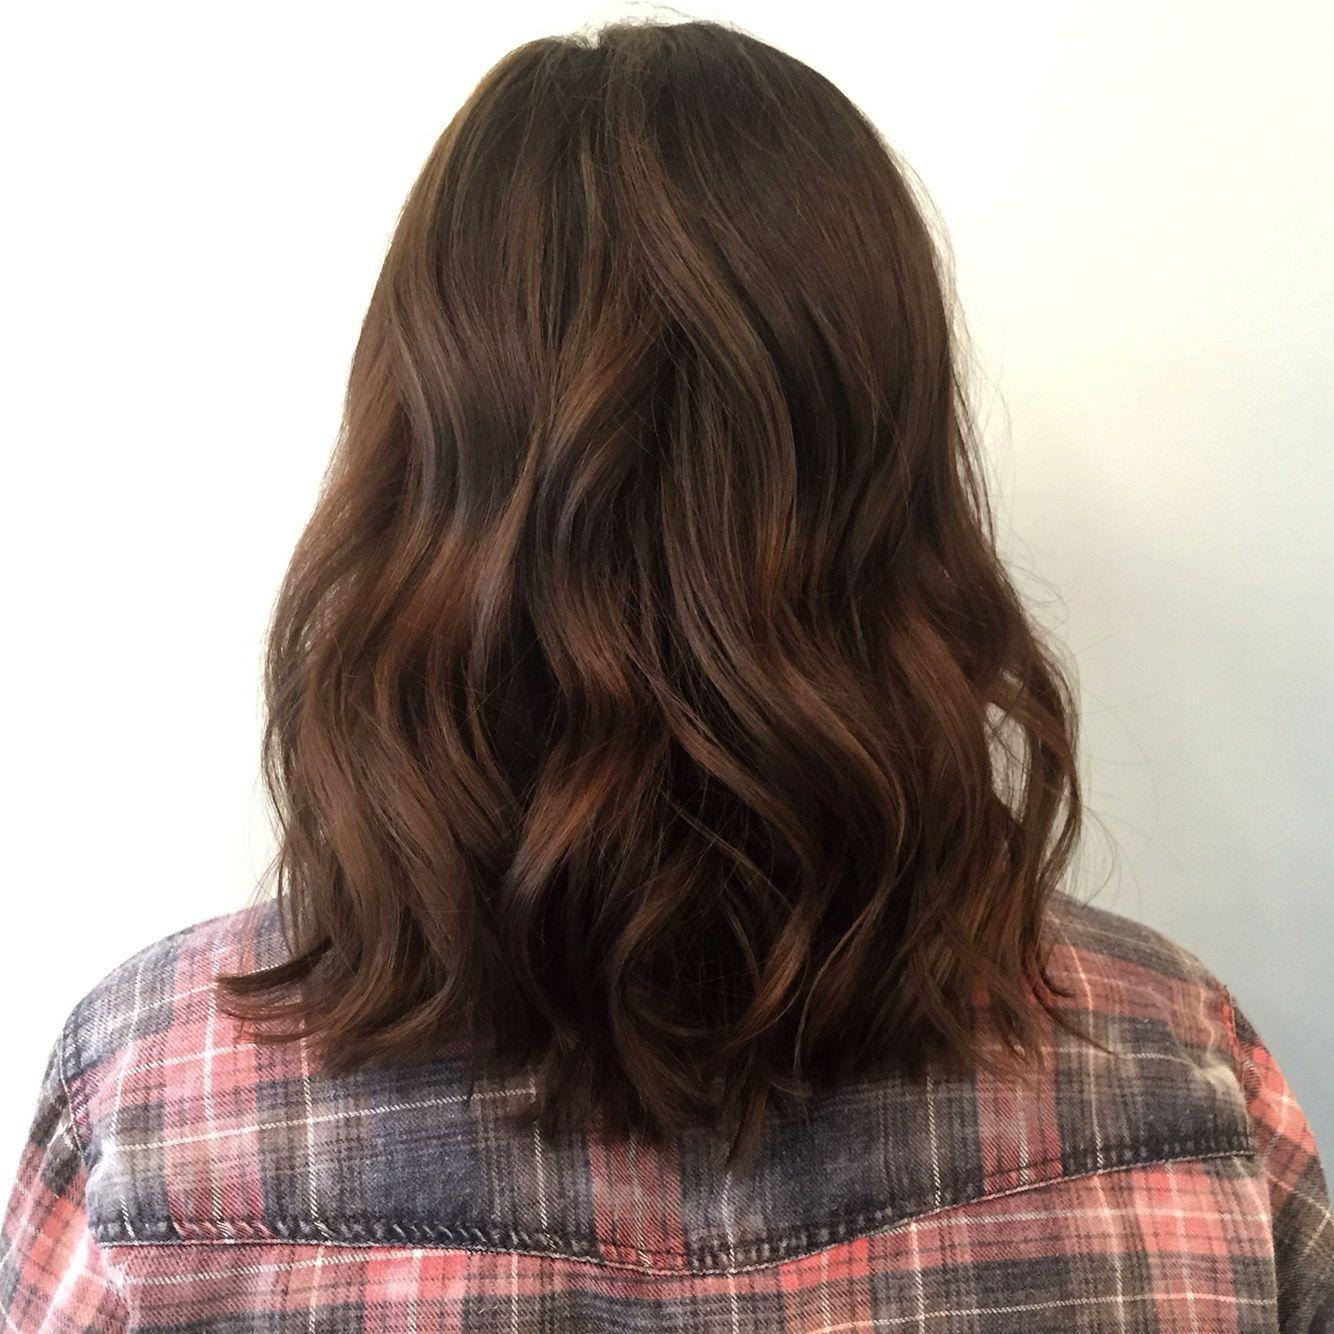 Dimensional Bob Lob Brunette Balayage Hair Highlights Short Medium Portland Hair By Holly At Blueprint Modern Hair I Modern Hairstyles Hair Hacks Hair